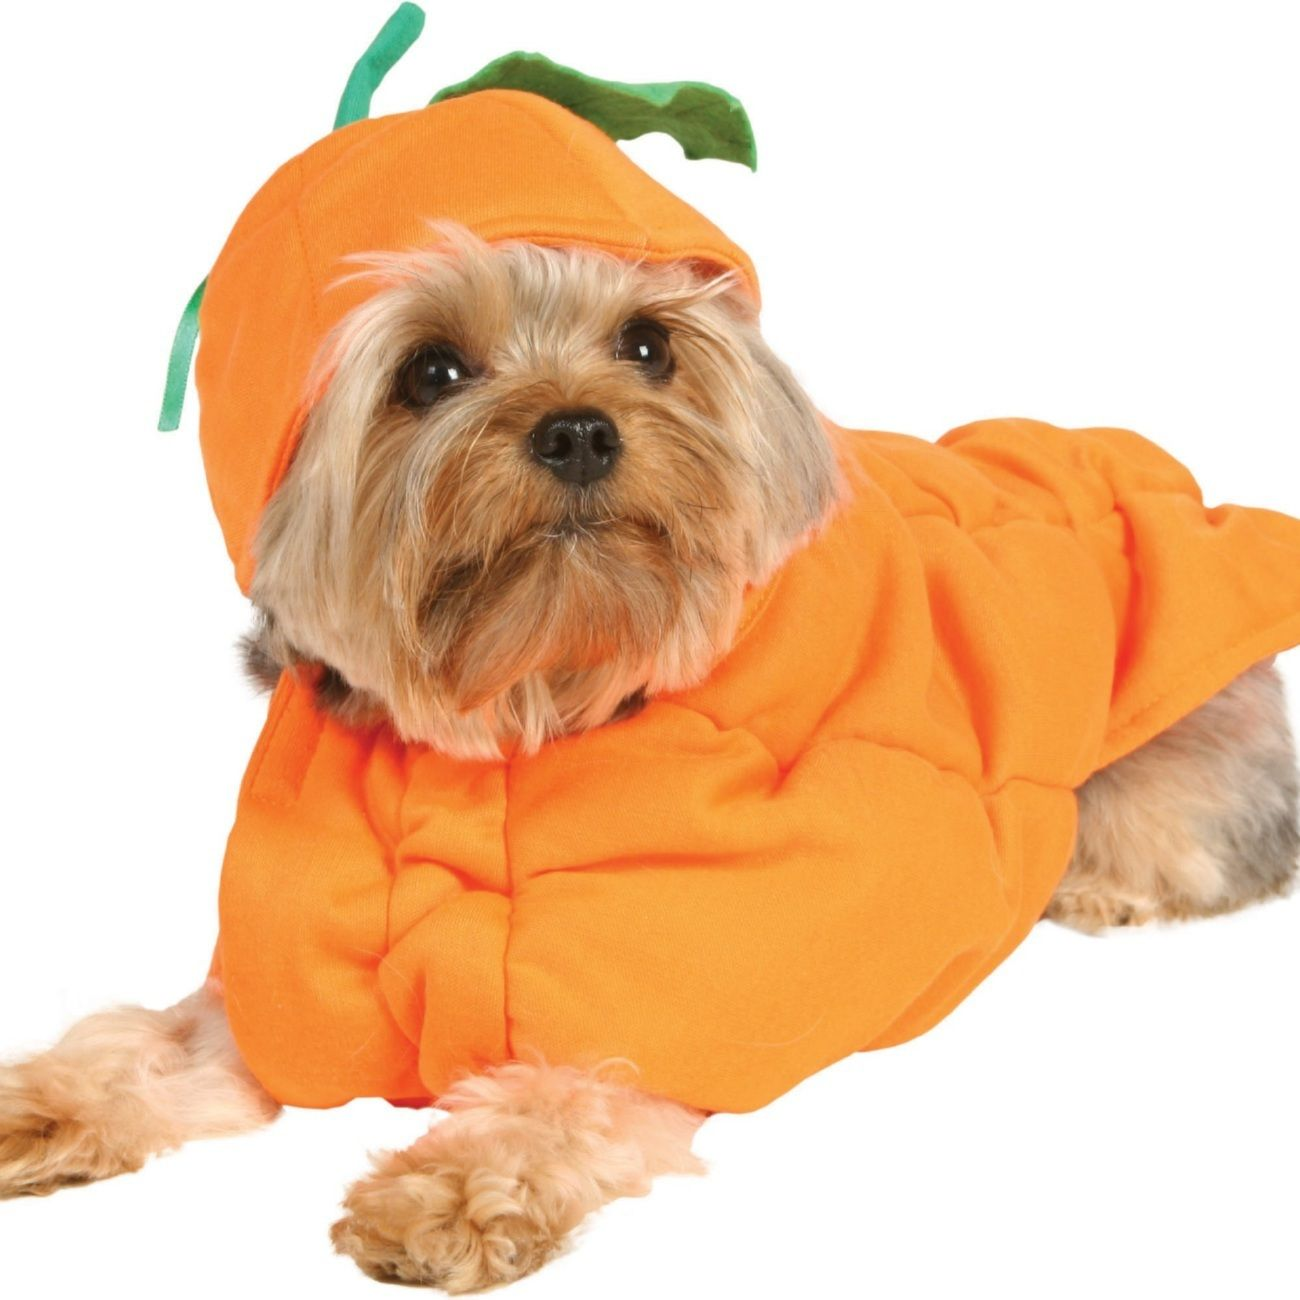 Pumpkin dog costume 34022 y2fgs7